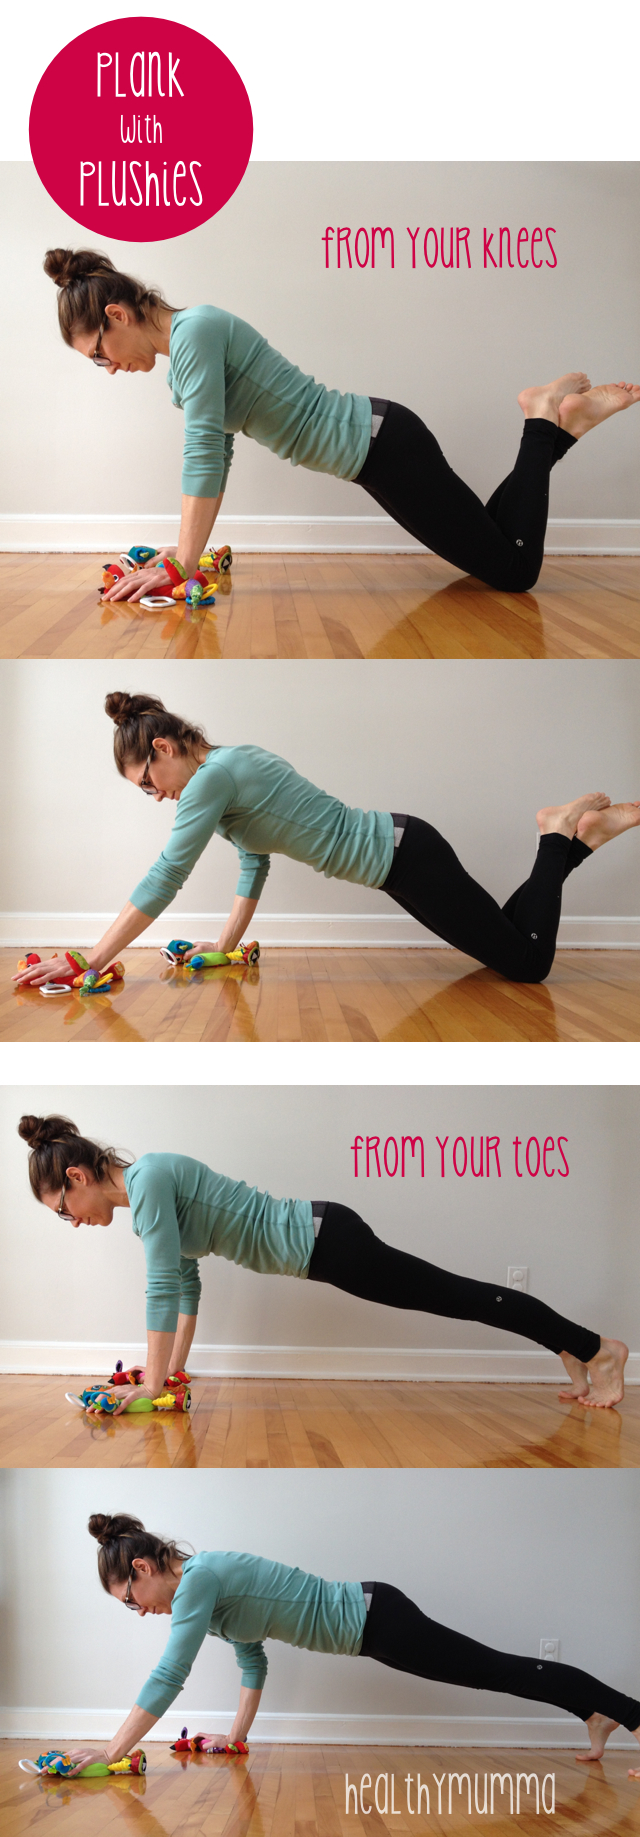 Plank variations for postpartum moms.